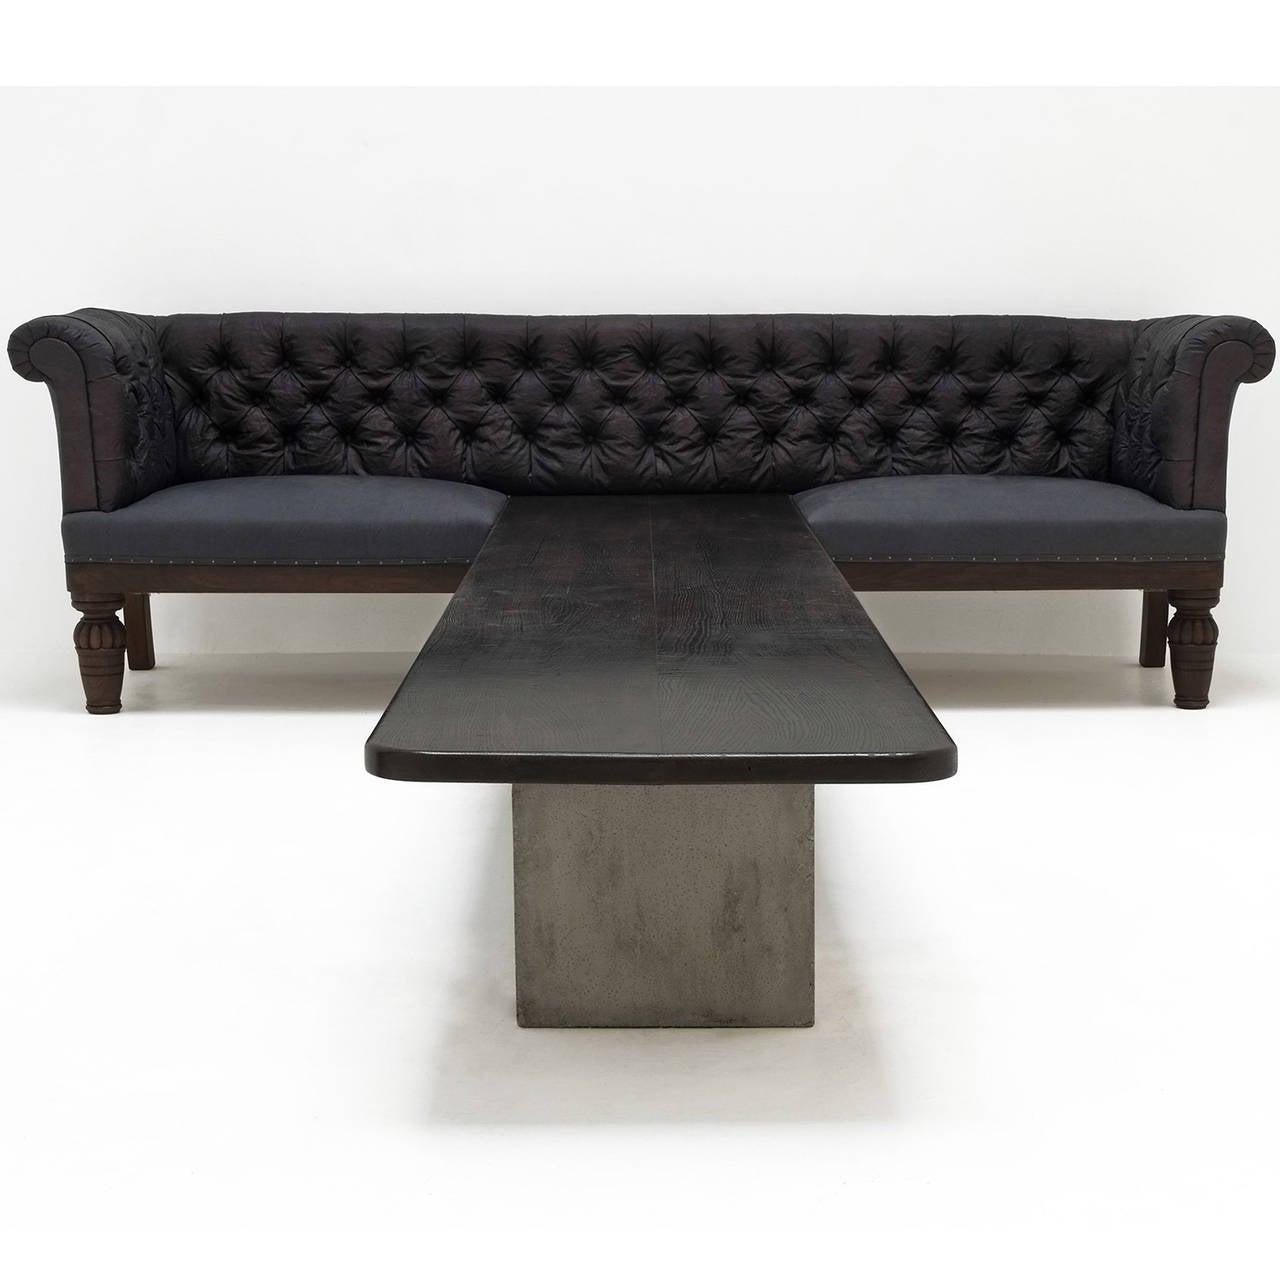 Chesterfield Table - Sculpture by JAMESPLUMB